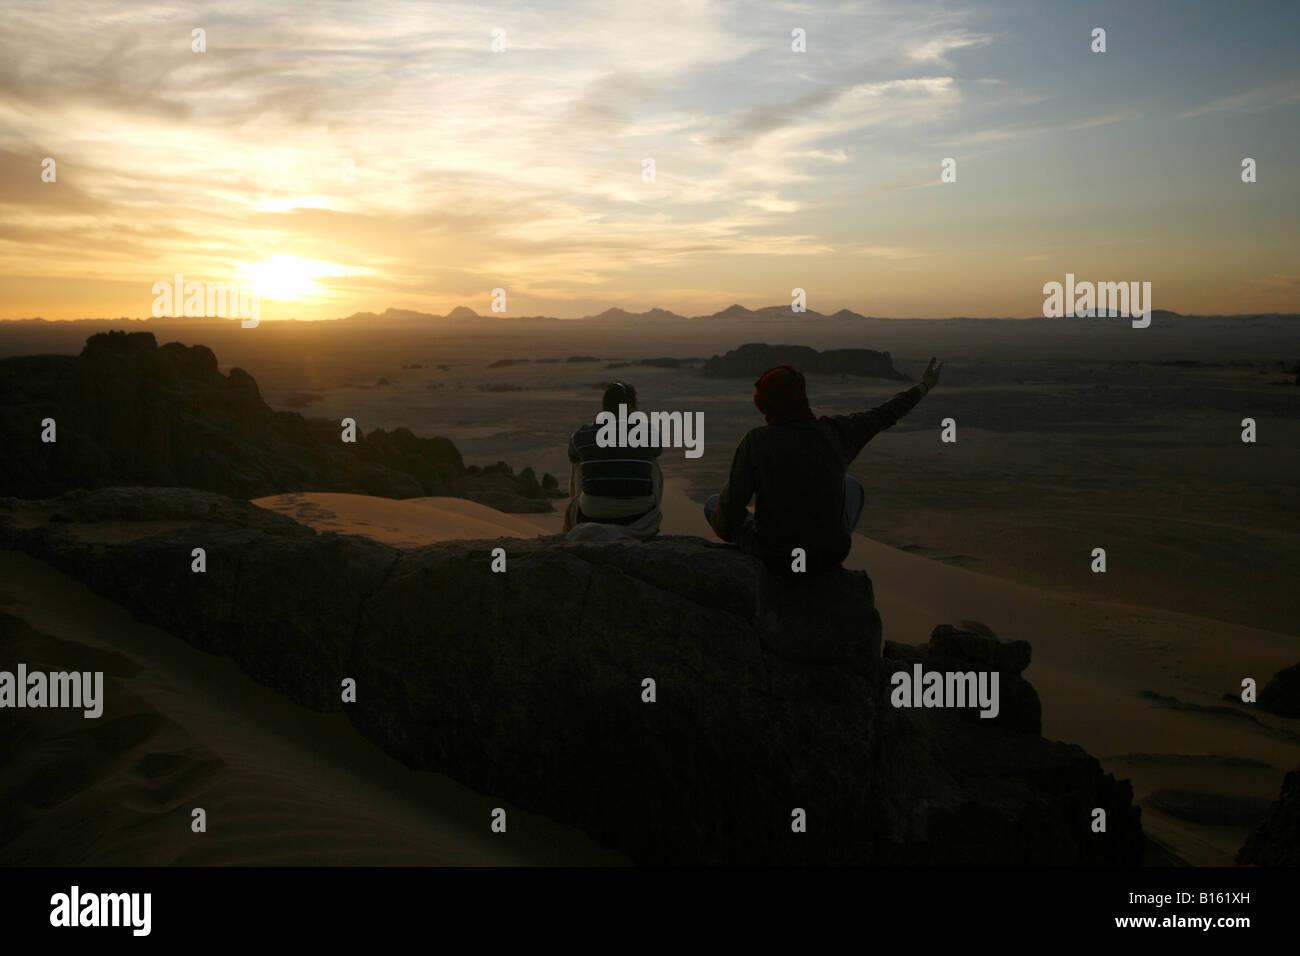 Couple looking at sunset Tagelment Samedat Tassili Ahaggar Sahara desert Algeria - Stock Image